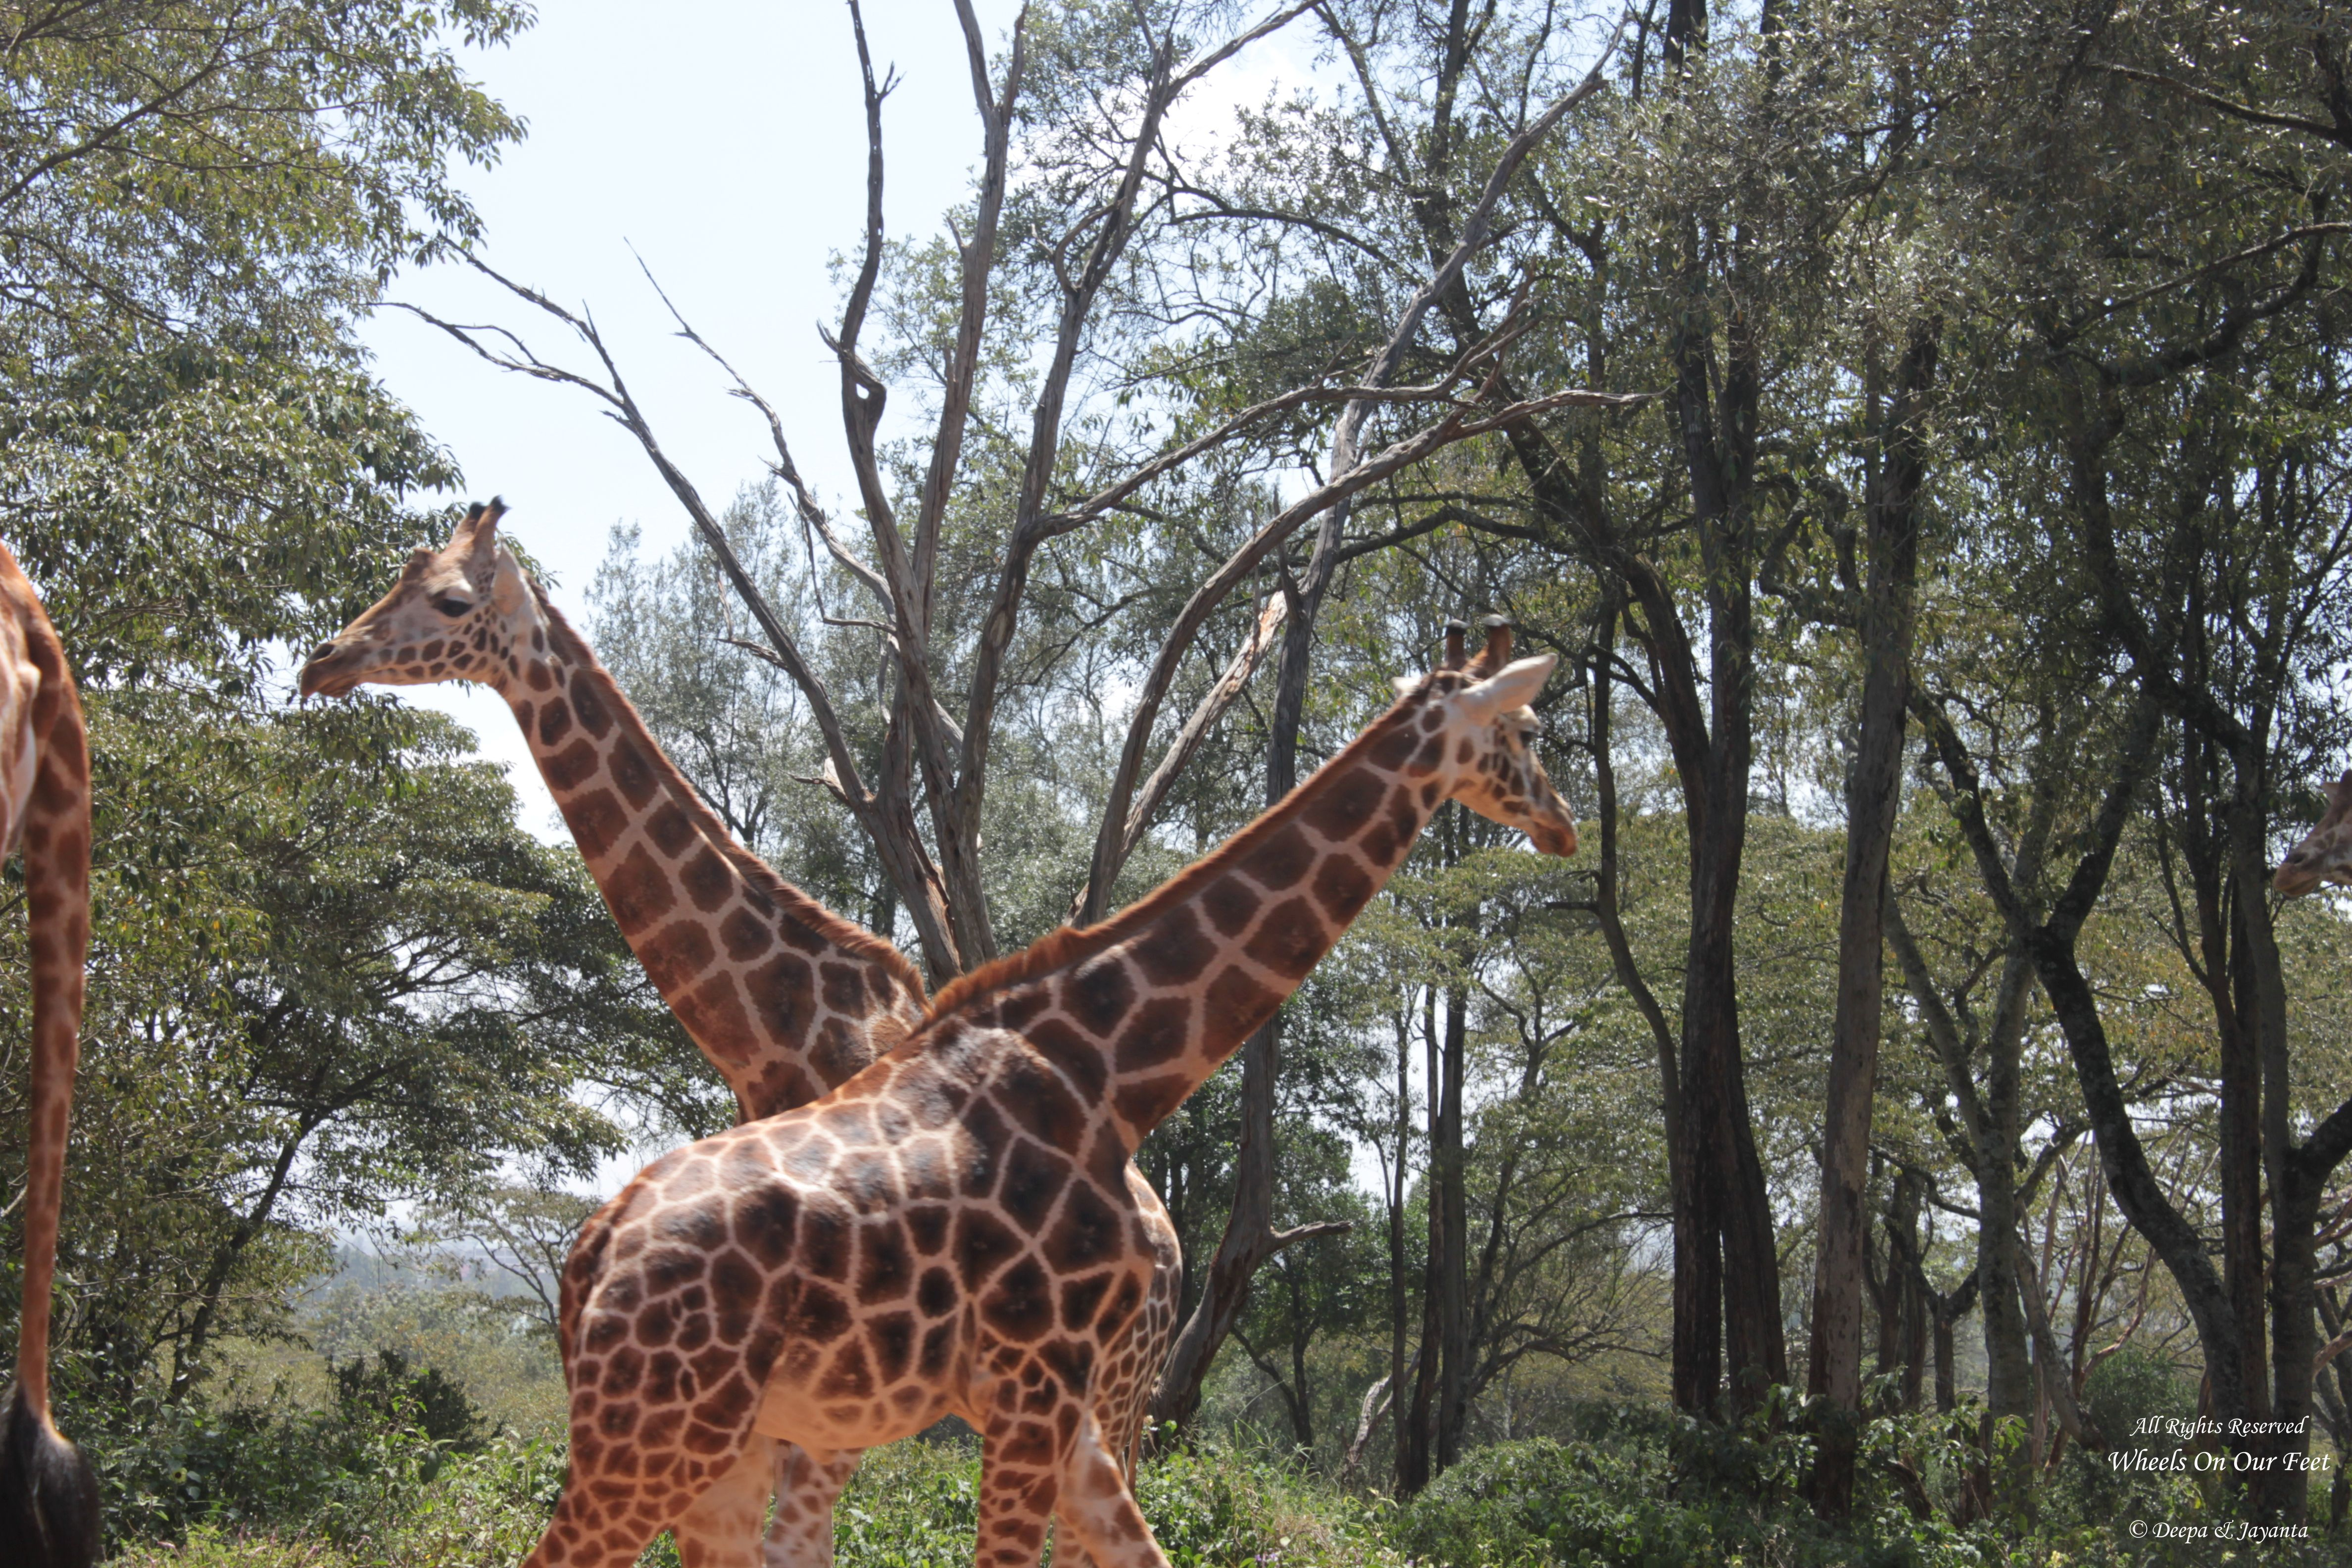 Tour of the Giraffe Centre in Nairobi, Kenya (13)